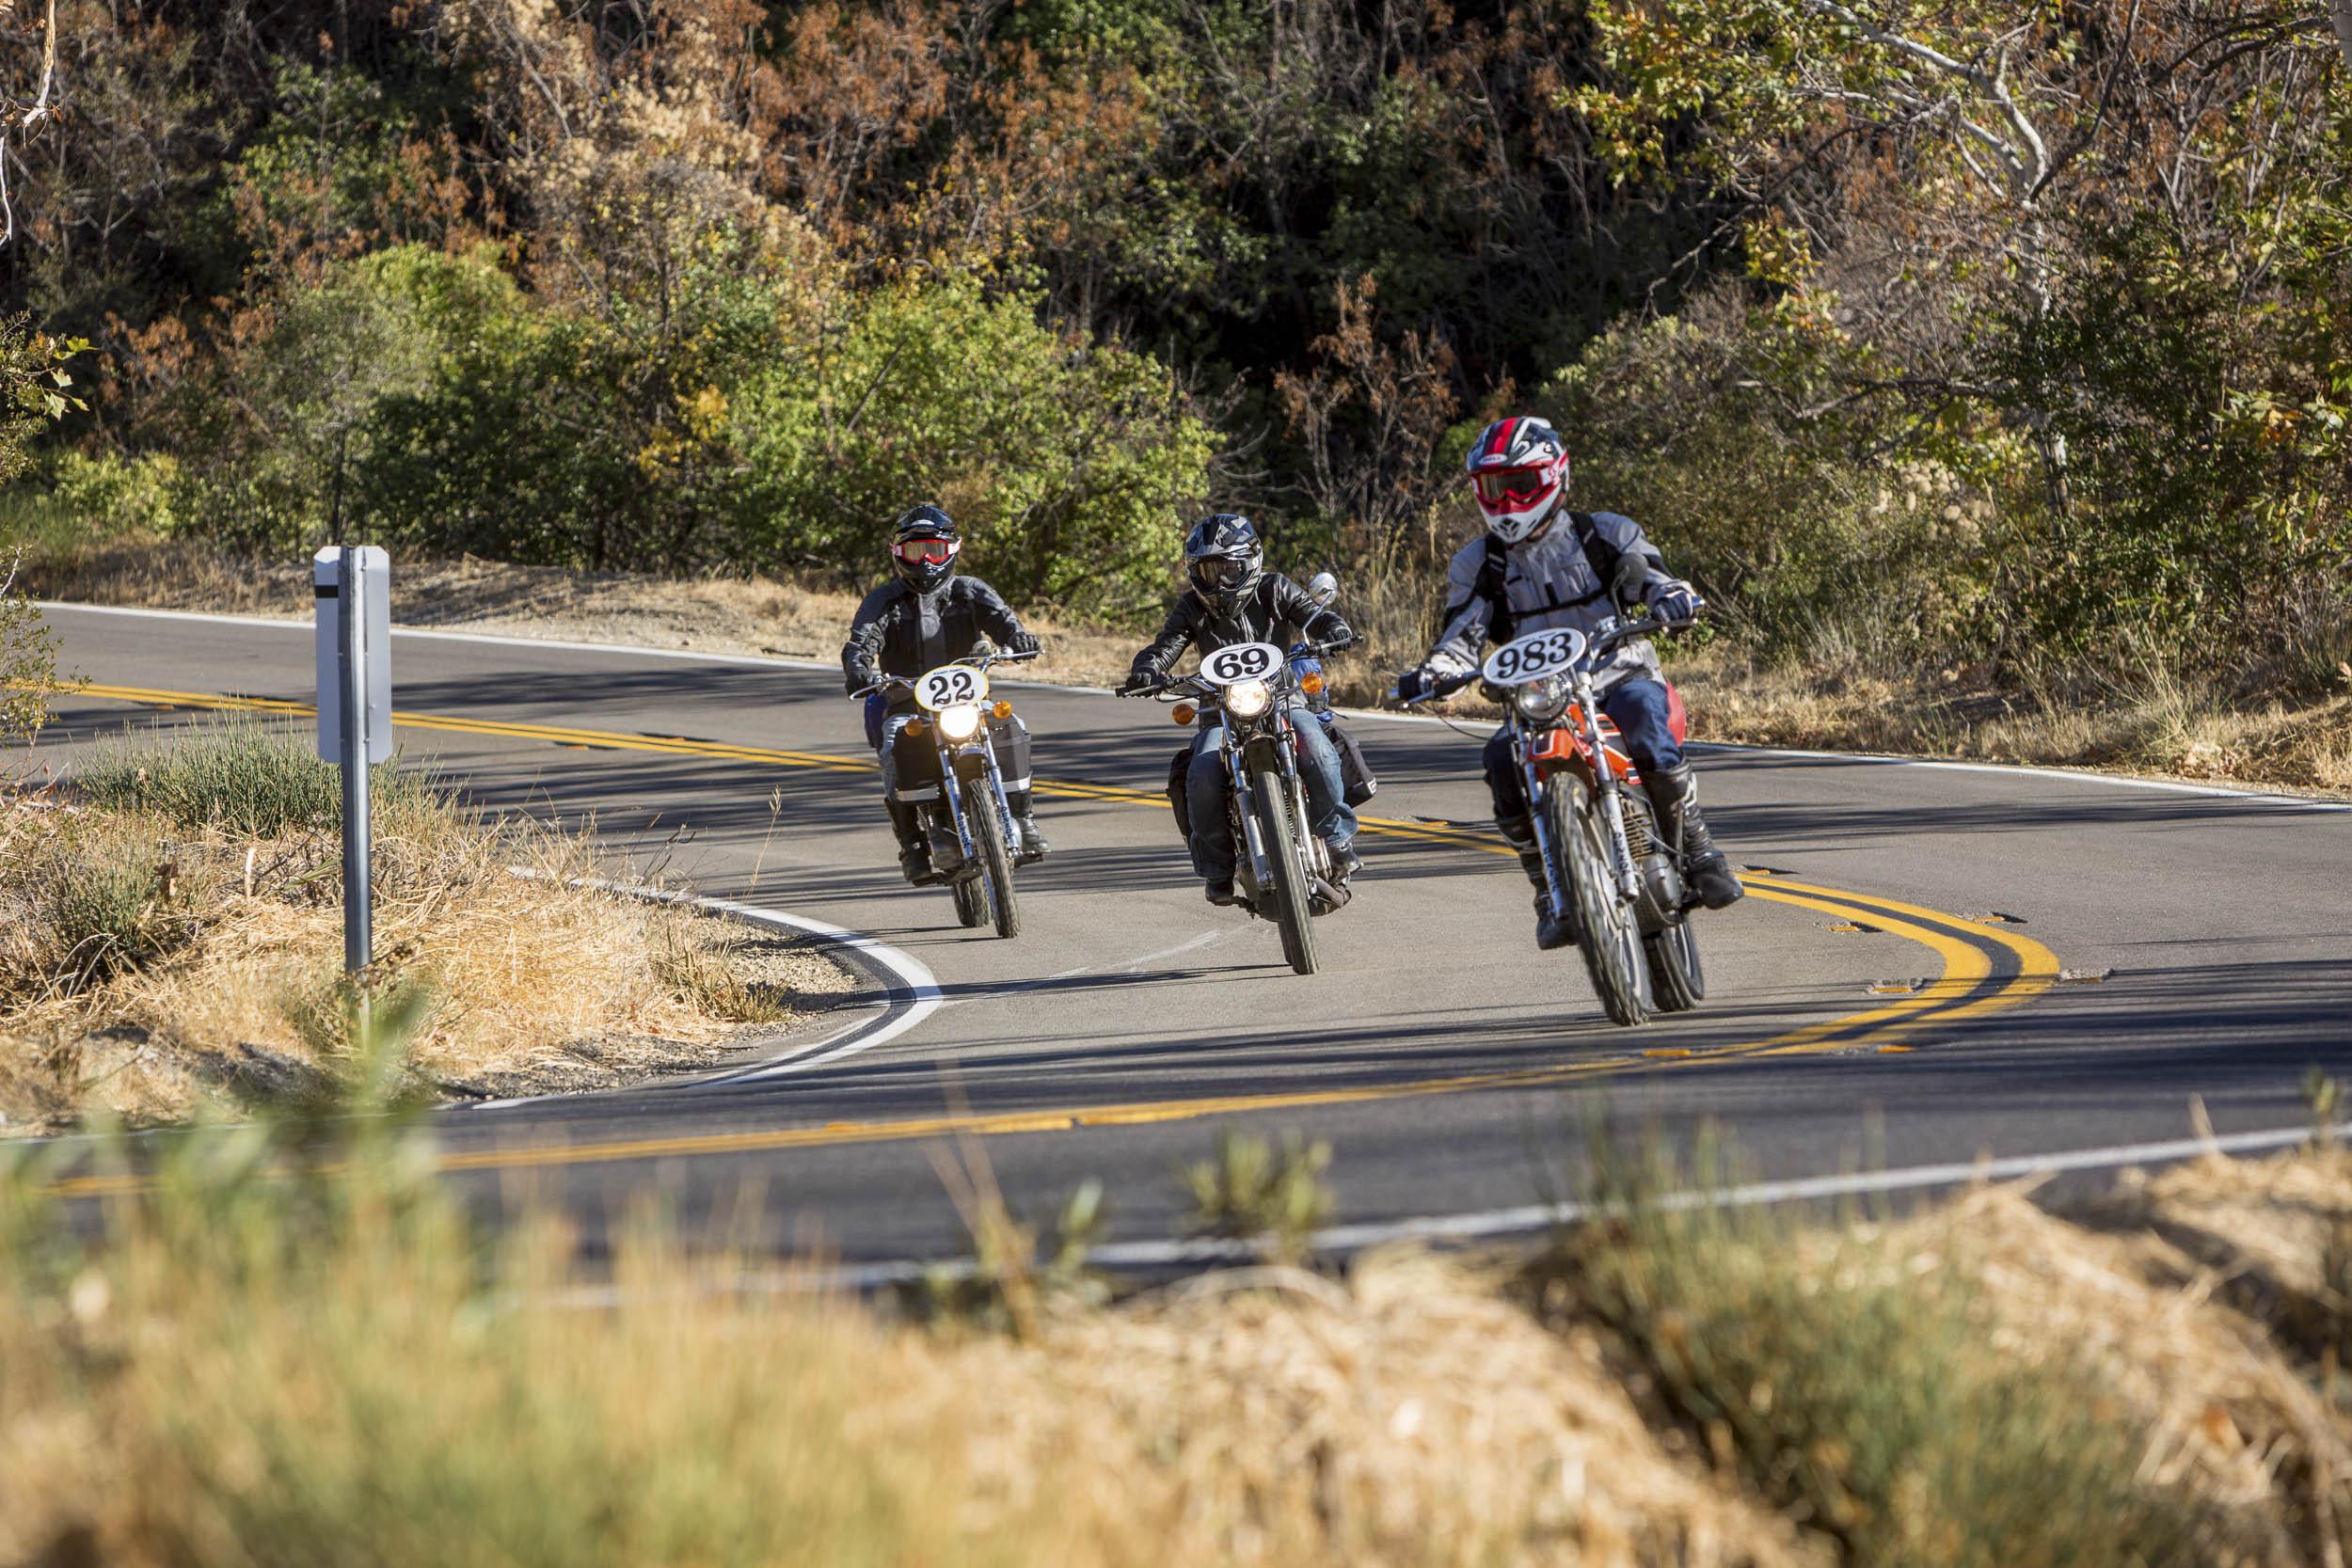 riding vintage motocross bikes